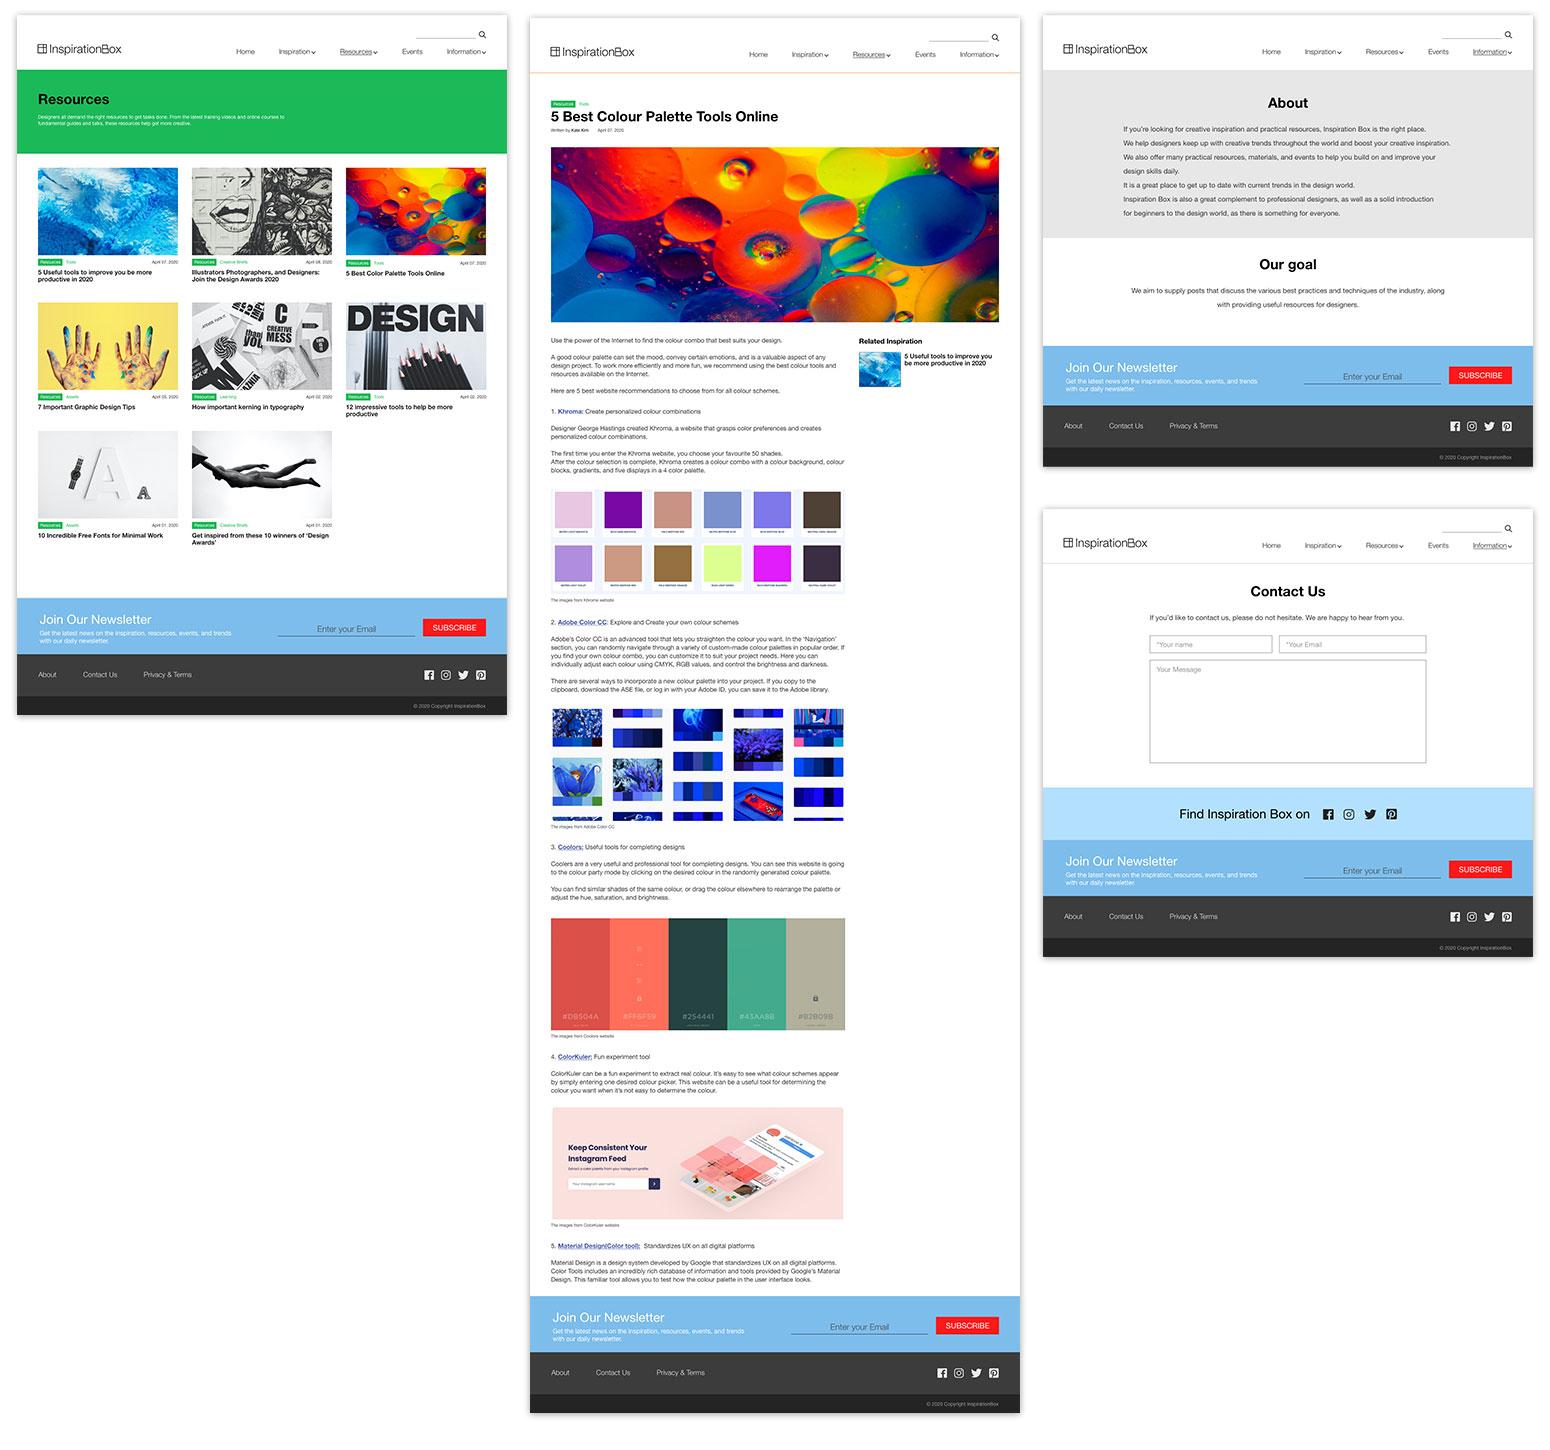 Inspirationbox.ca Website Design